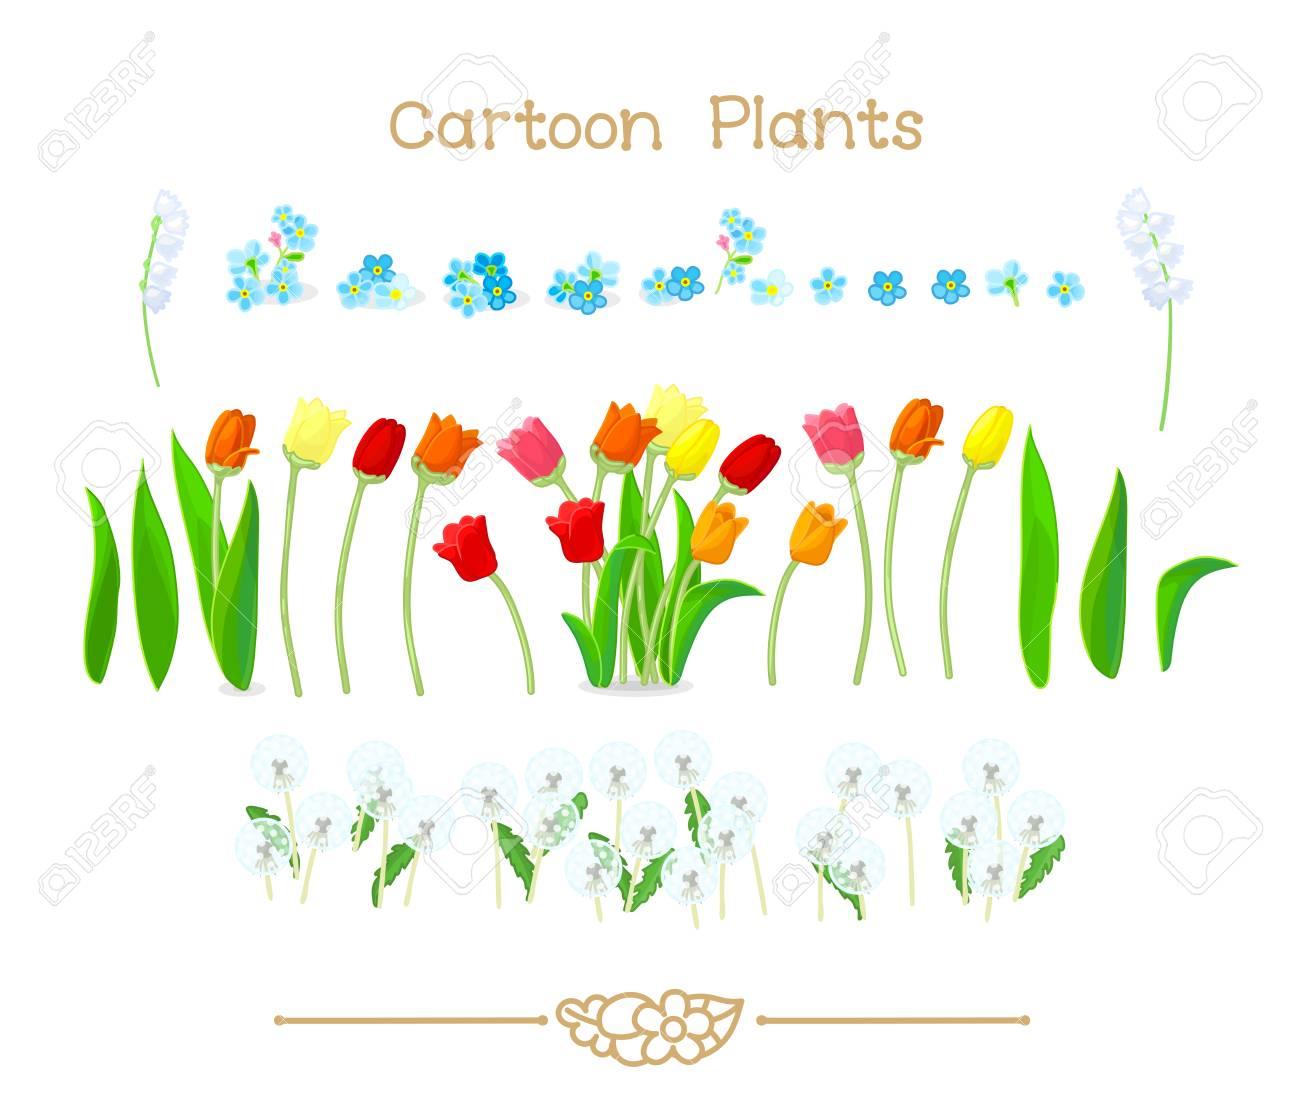 Illustration Sammlung Cartoon Pflanzen Frühling Tulpen Blumen